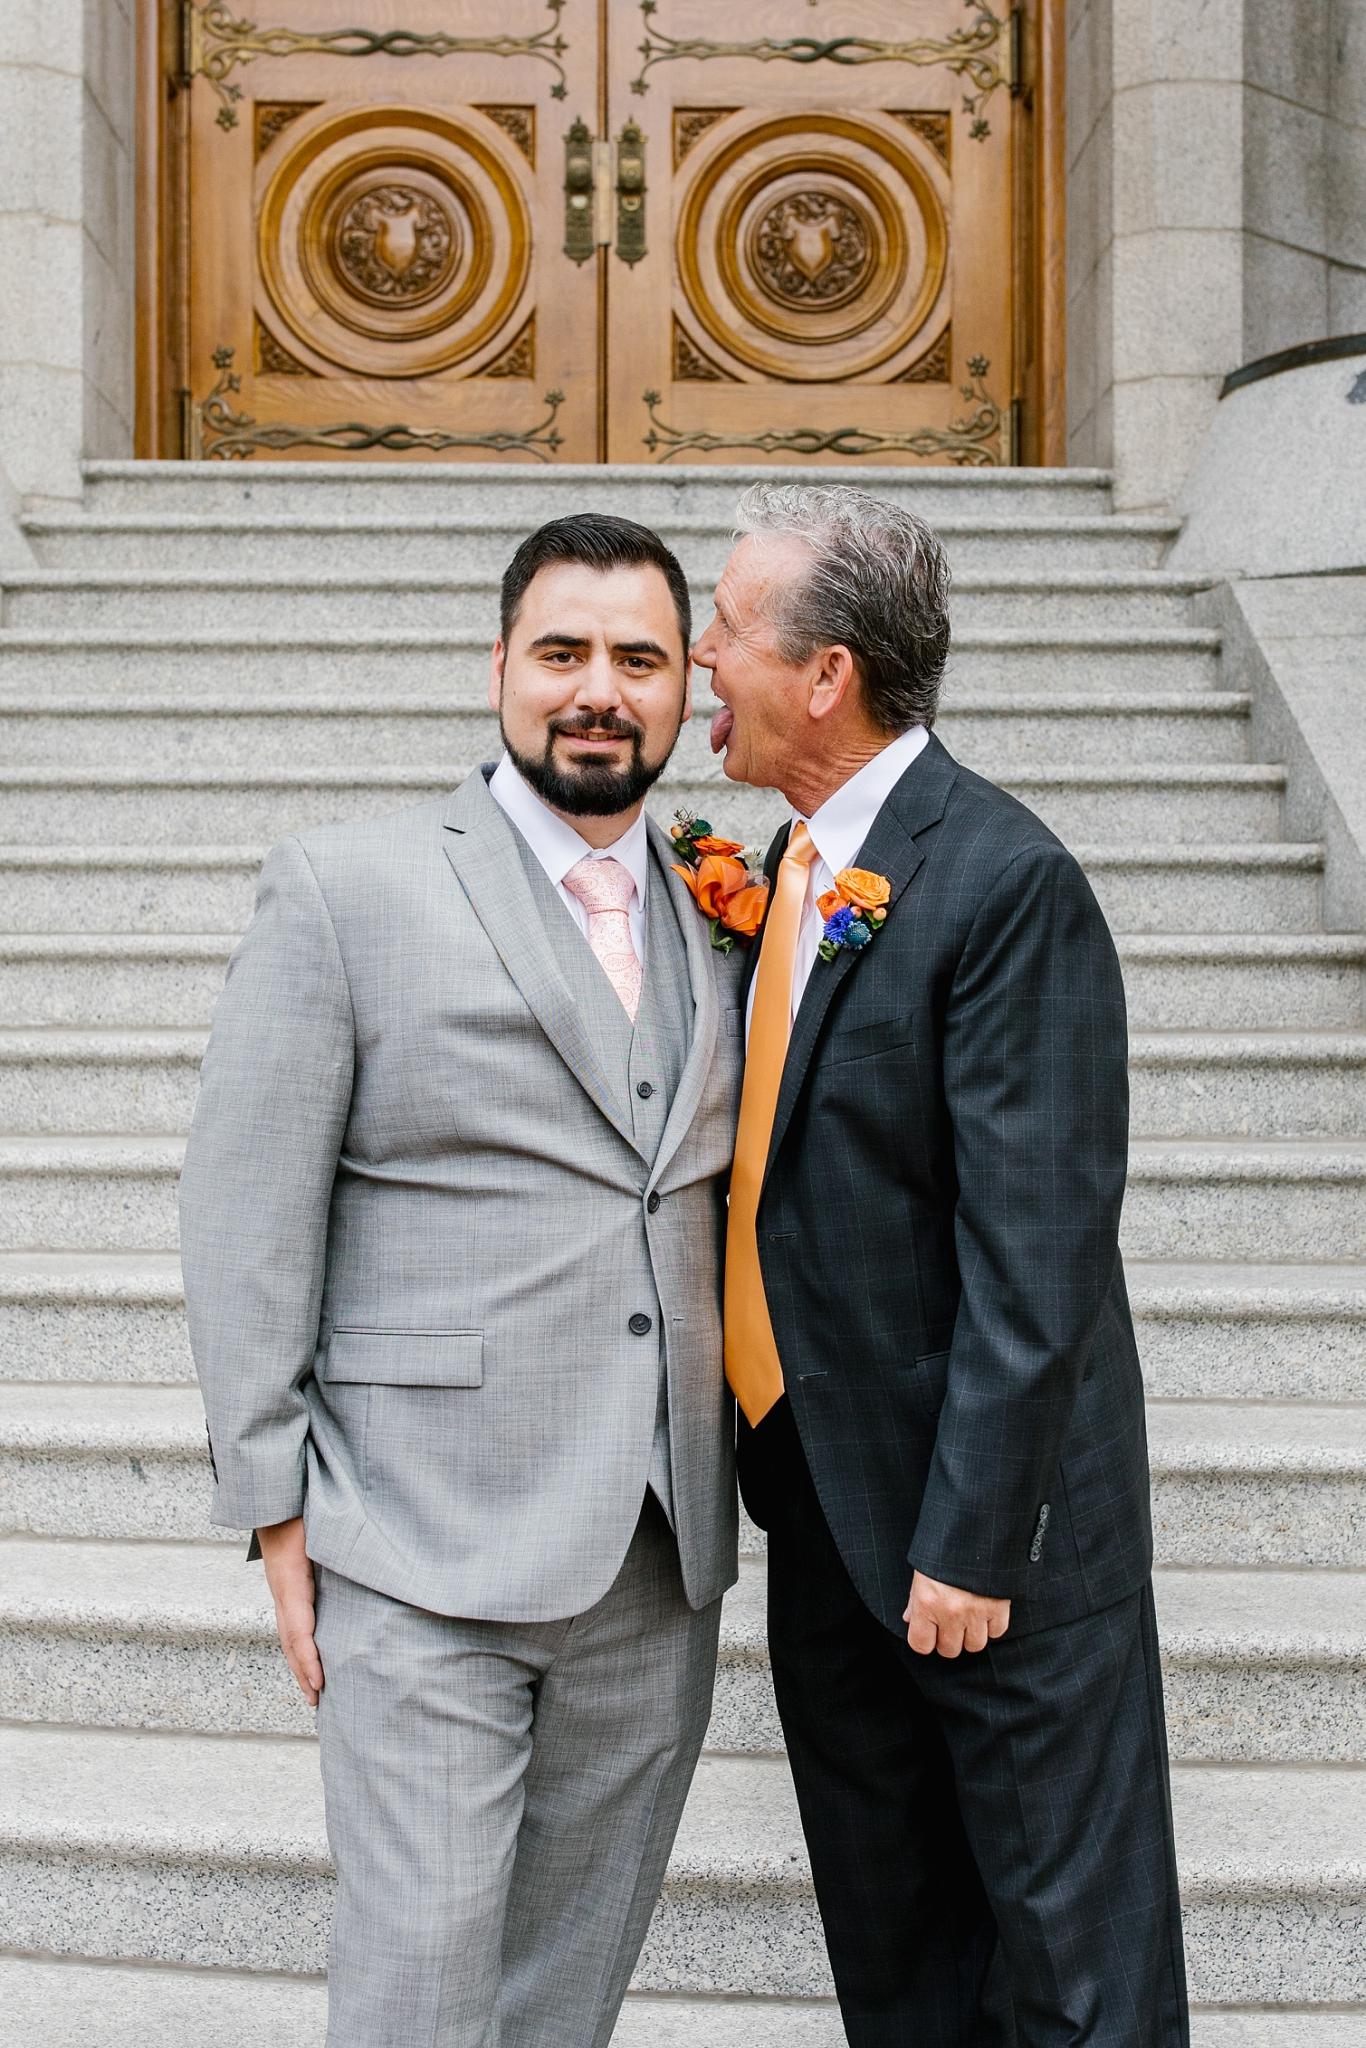 Justin and Melissa-72_Lizzie-B-Imagery-Utah-Wedding-Photographer-Salt-Lake-City-Temple-Photographer-Lion-House-Luncheon-The-Grand-Ballroom-Bountiful.jpg